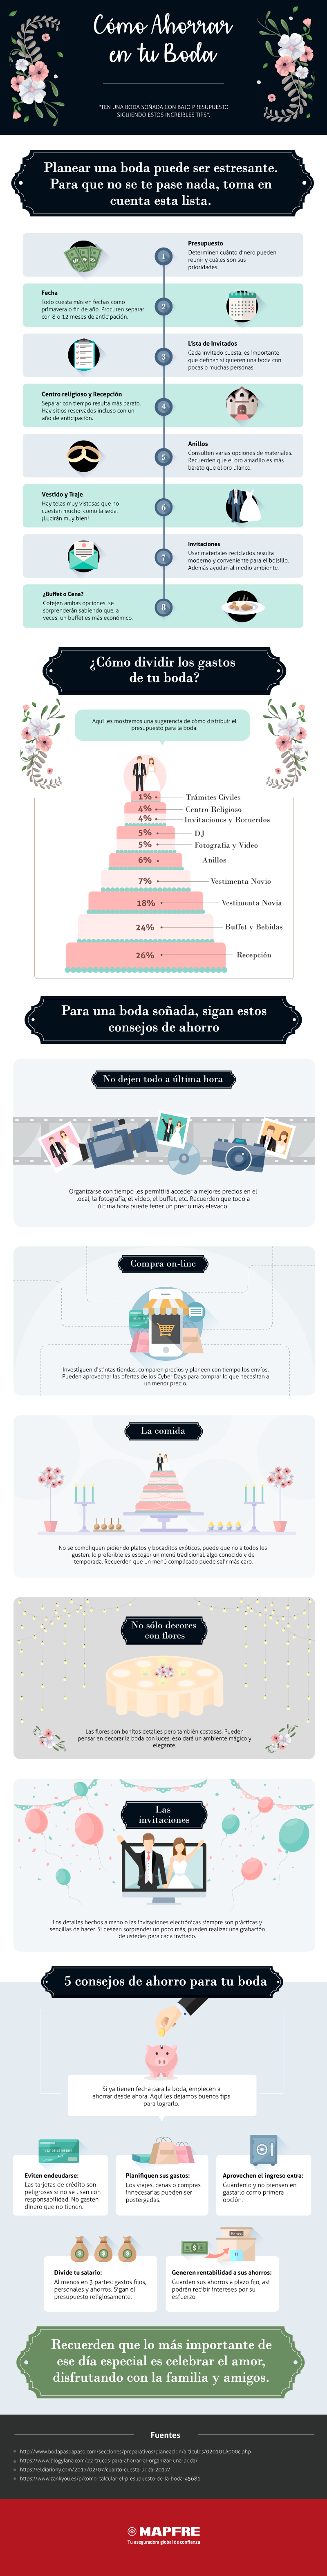 infografía ahorro boda